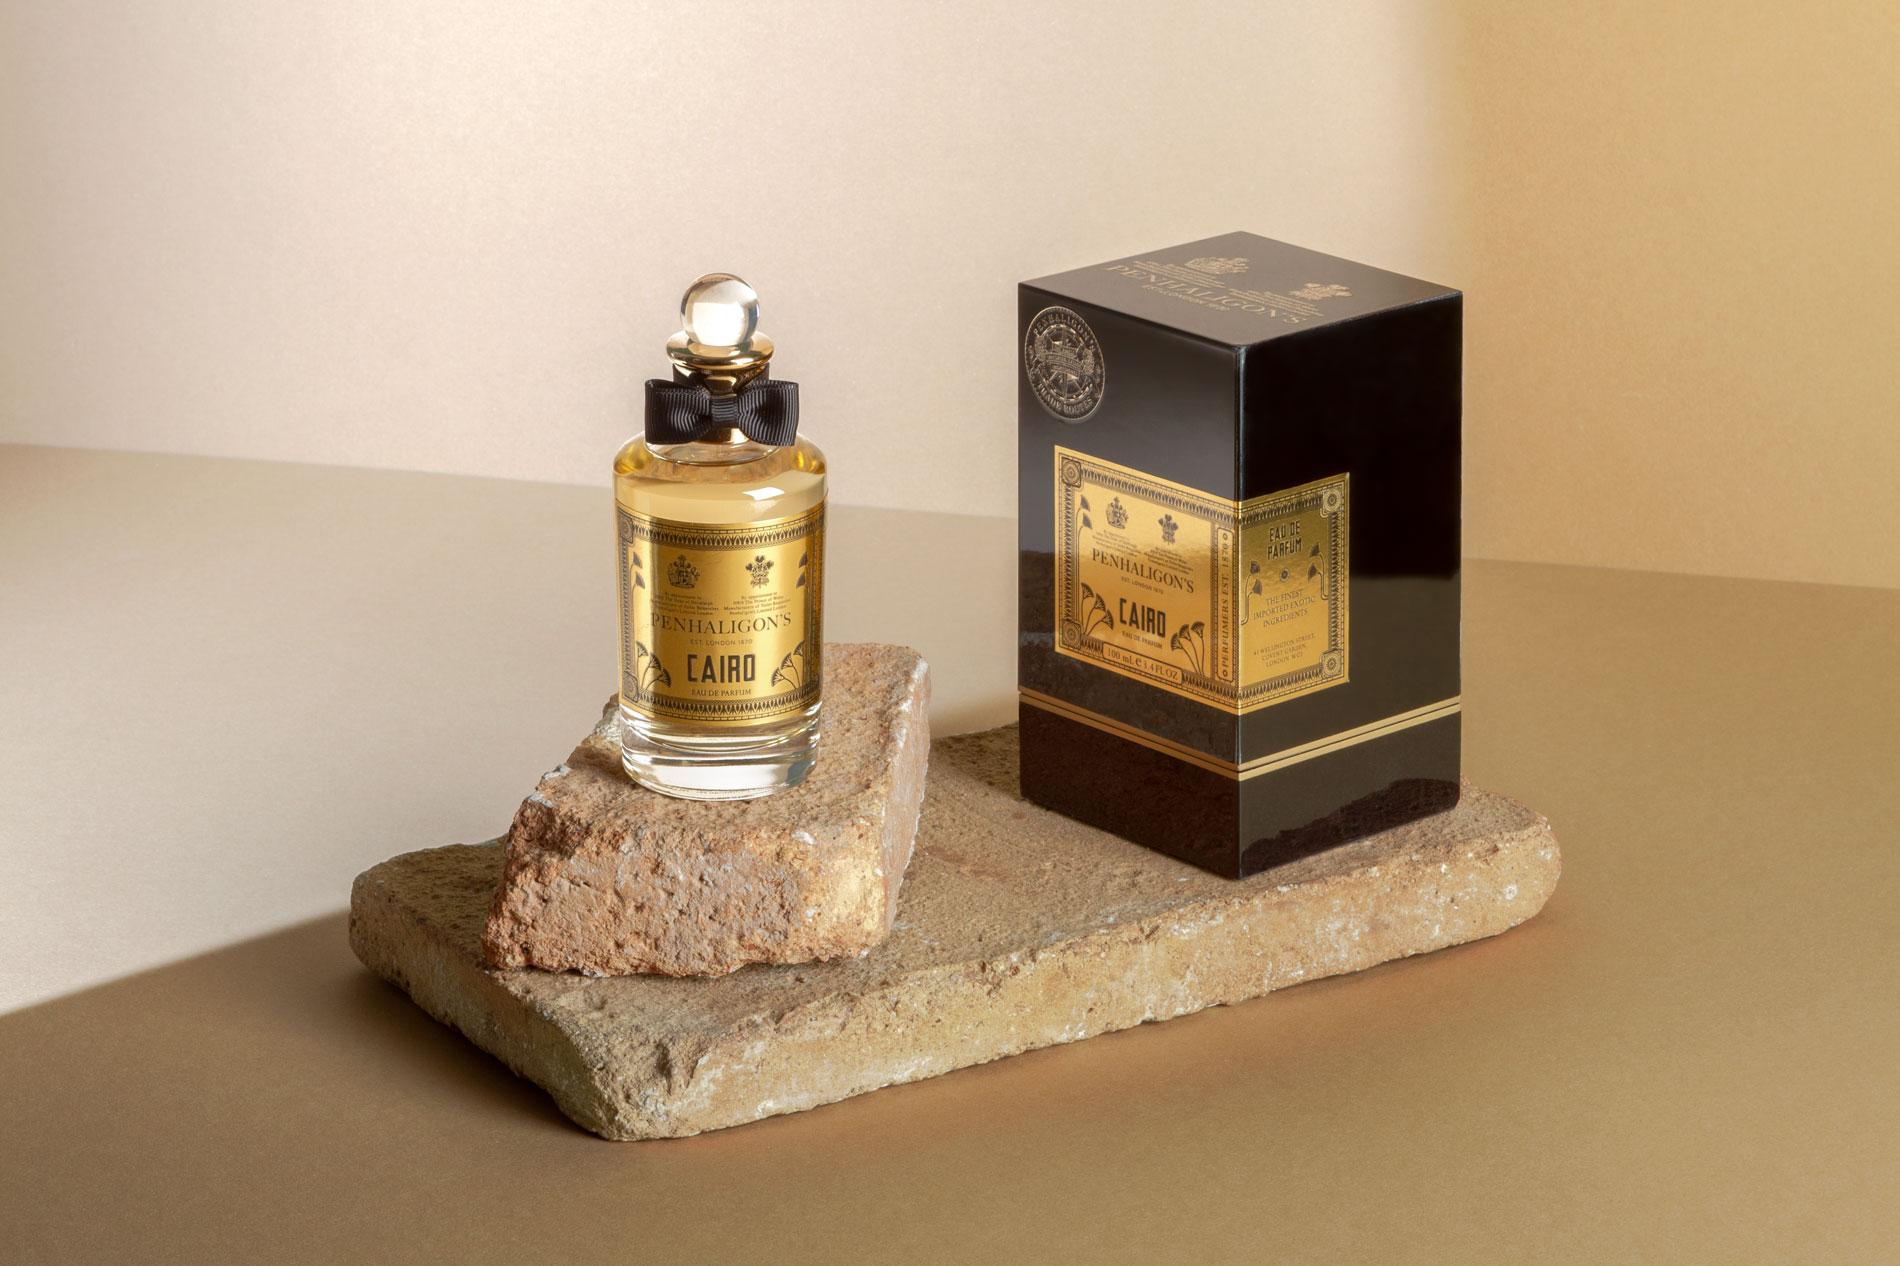 Penhaligon's Cairo packaging design